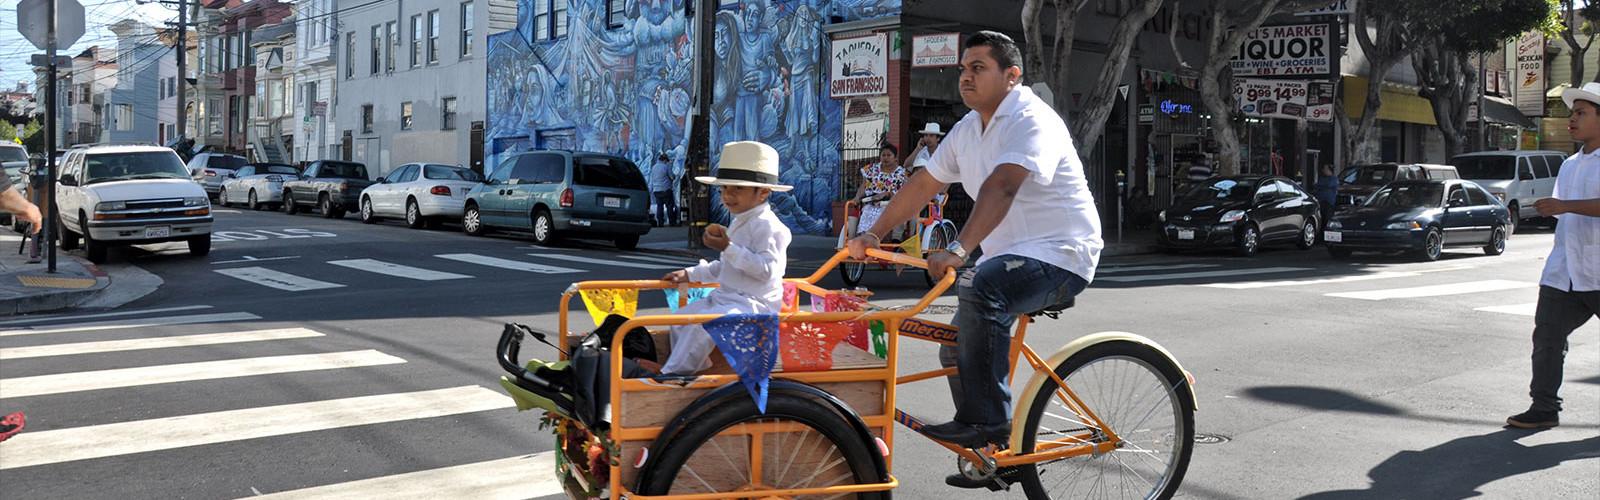 carousel-bicycle-york-1600-1600x500.jpg